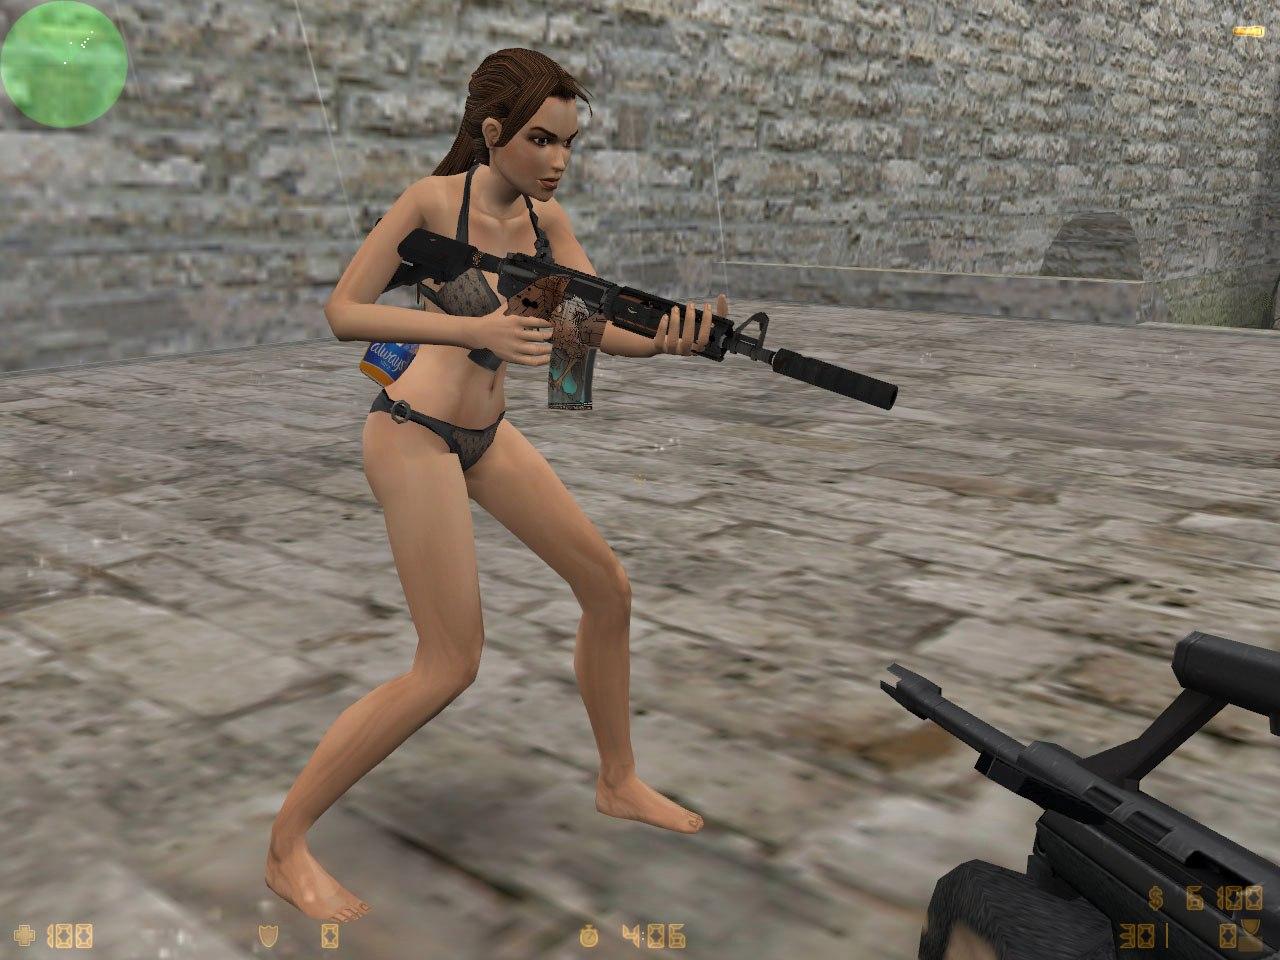 Lara croft bikini erotic clip